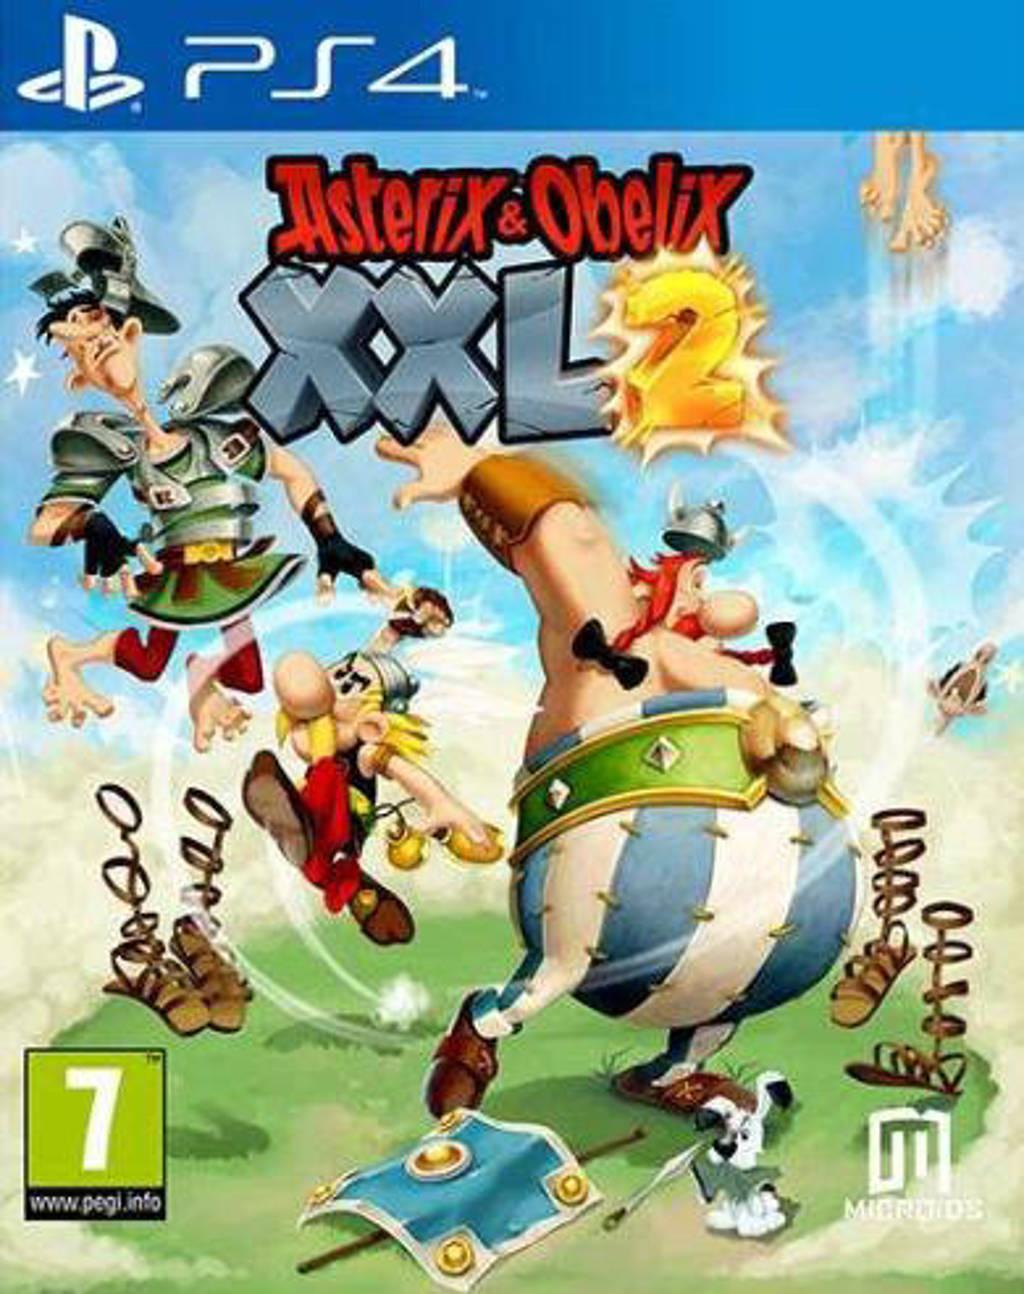 Asterix & Obelix - XXL 2 (PlayStation 4)